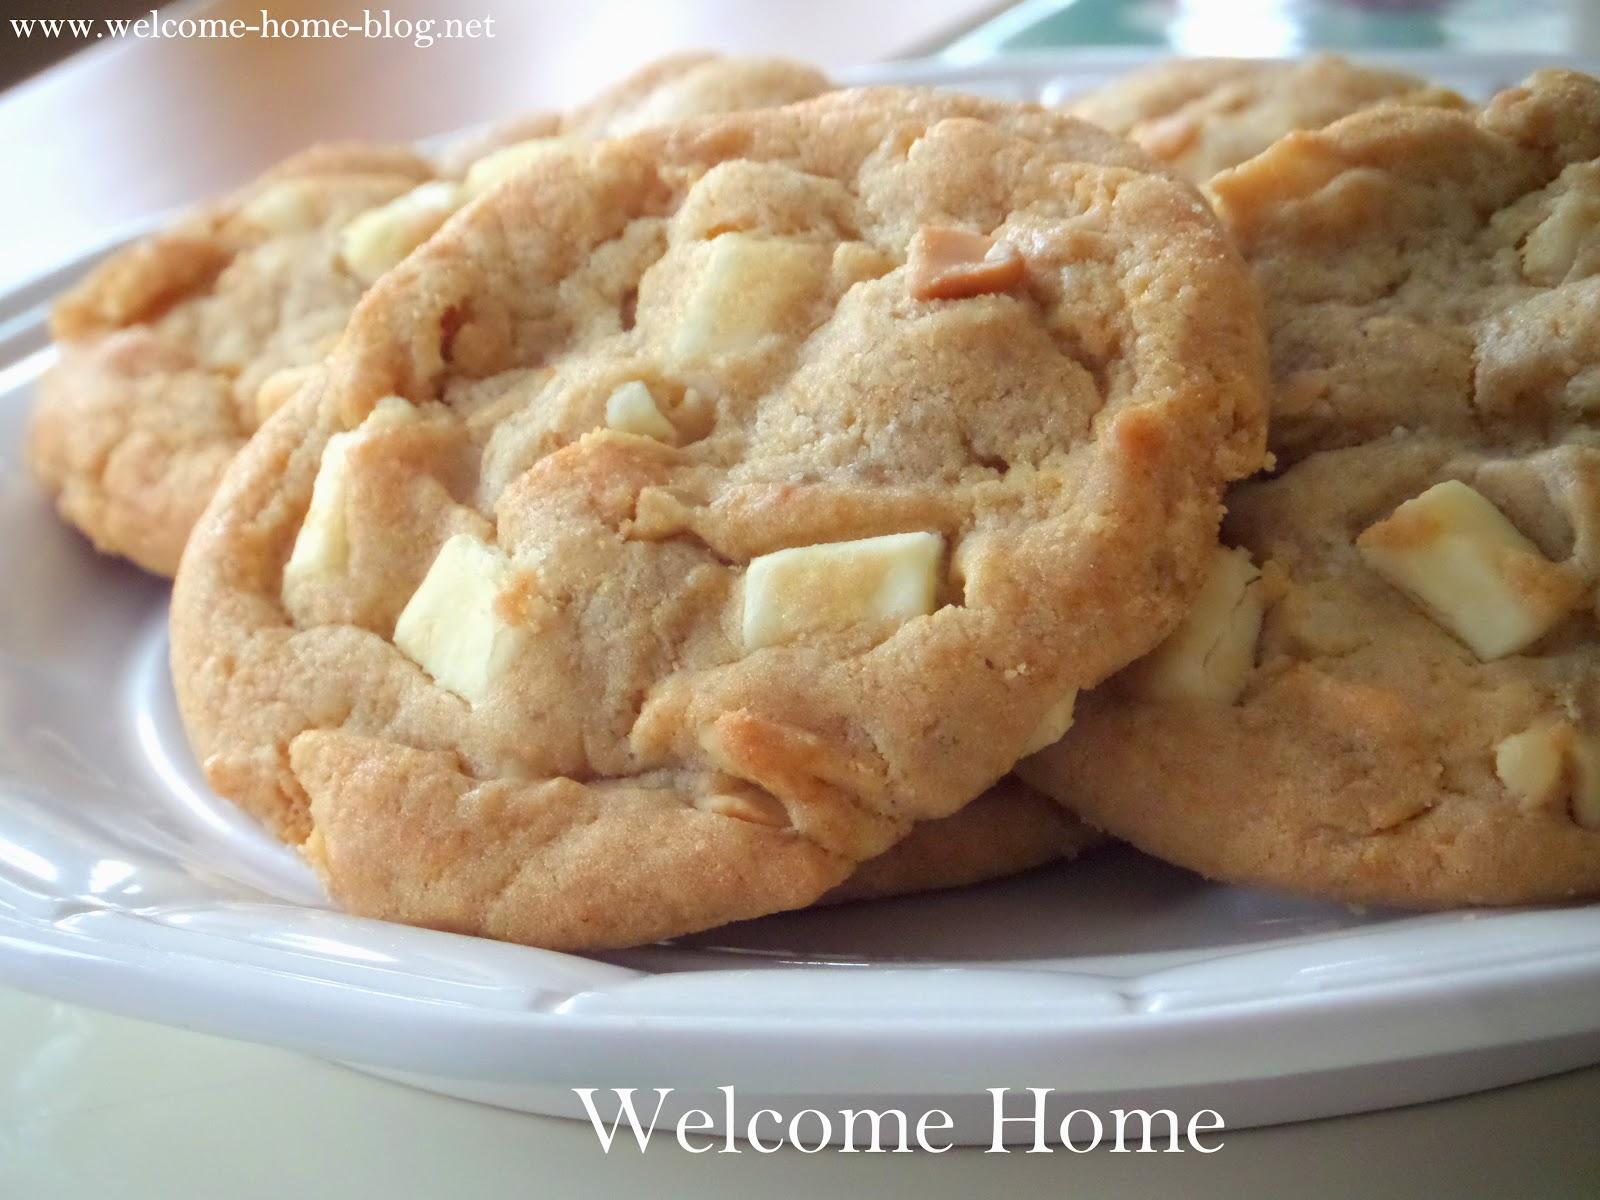 Welcome Home Blog: White Chocolate Macadamia Nut Cookies